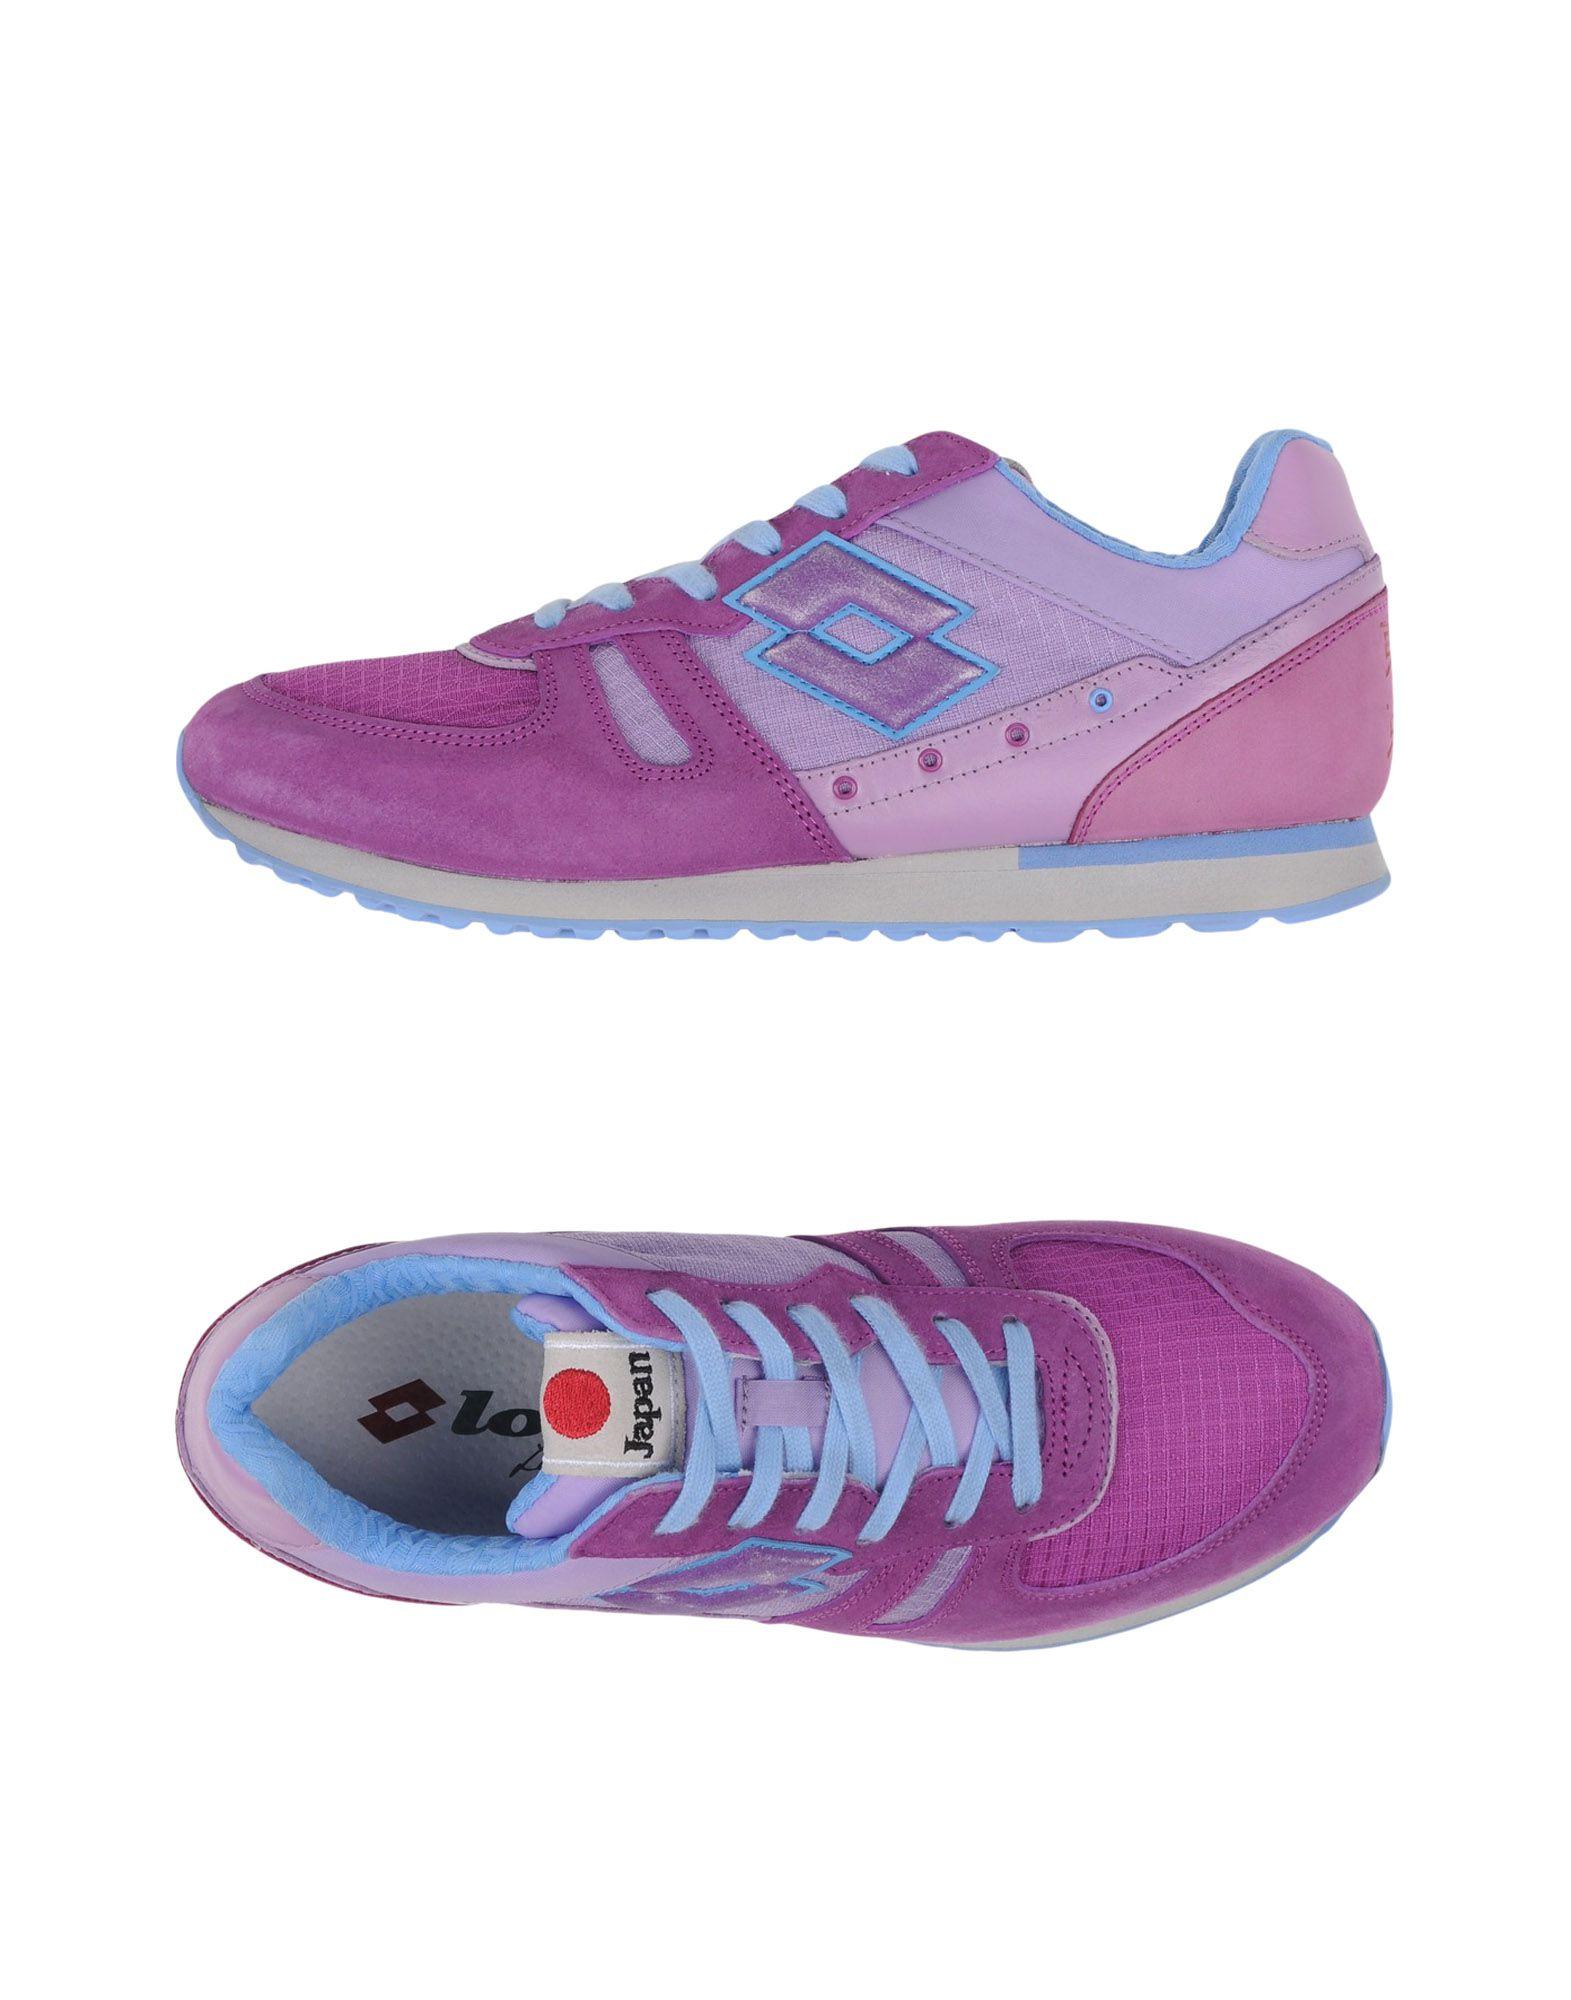 Sneakers Lotto Leggenda Tokyo Shibuya W - Donna - 11006483PX